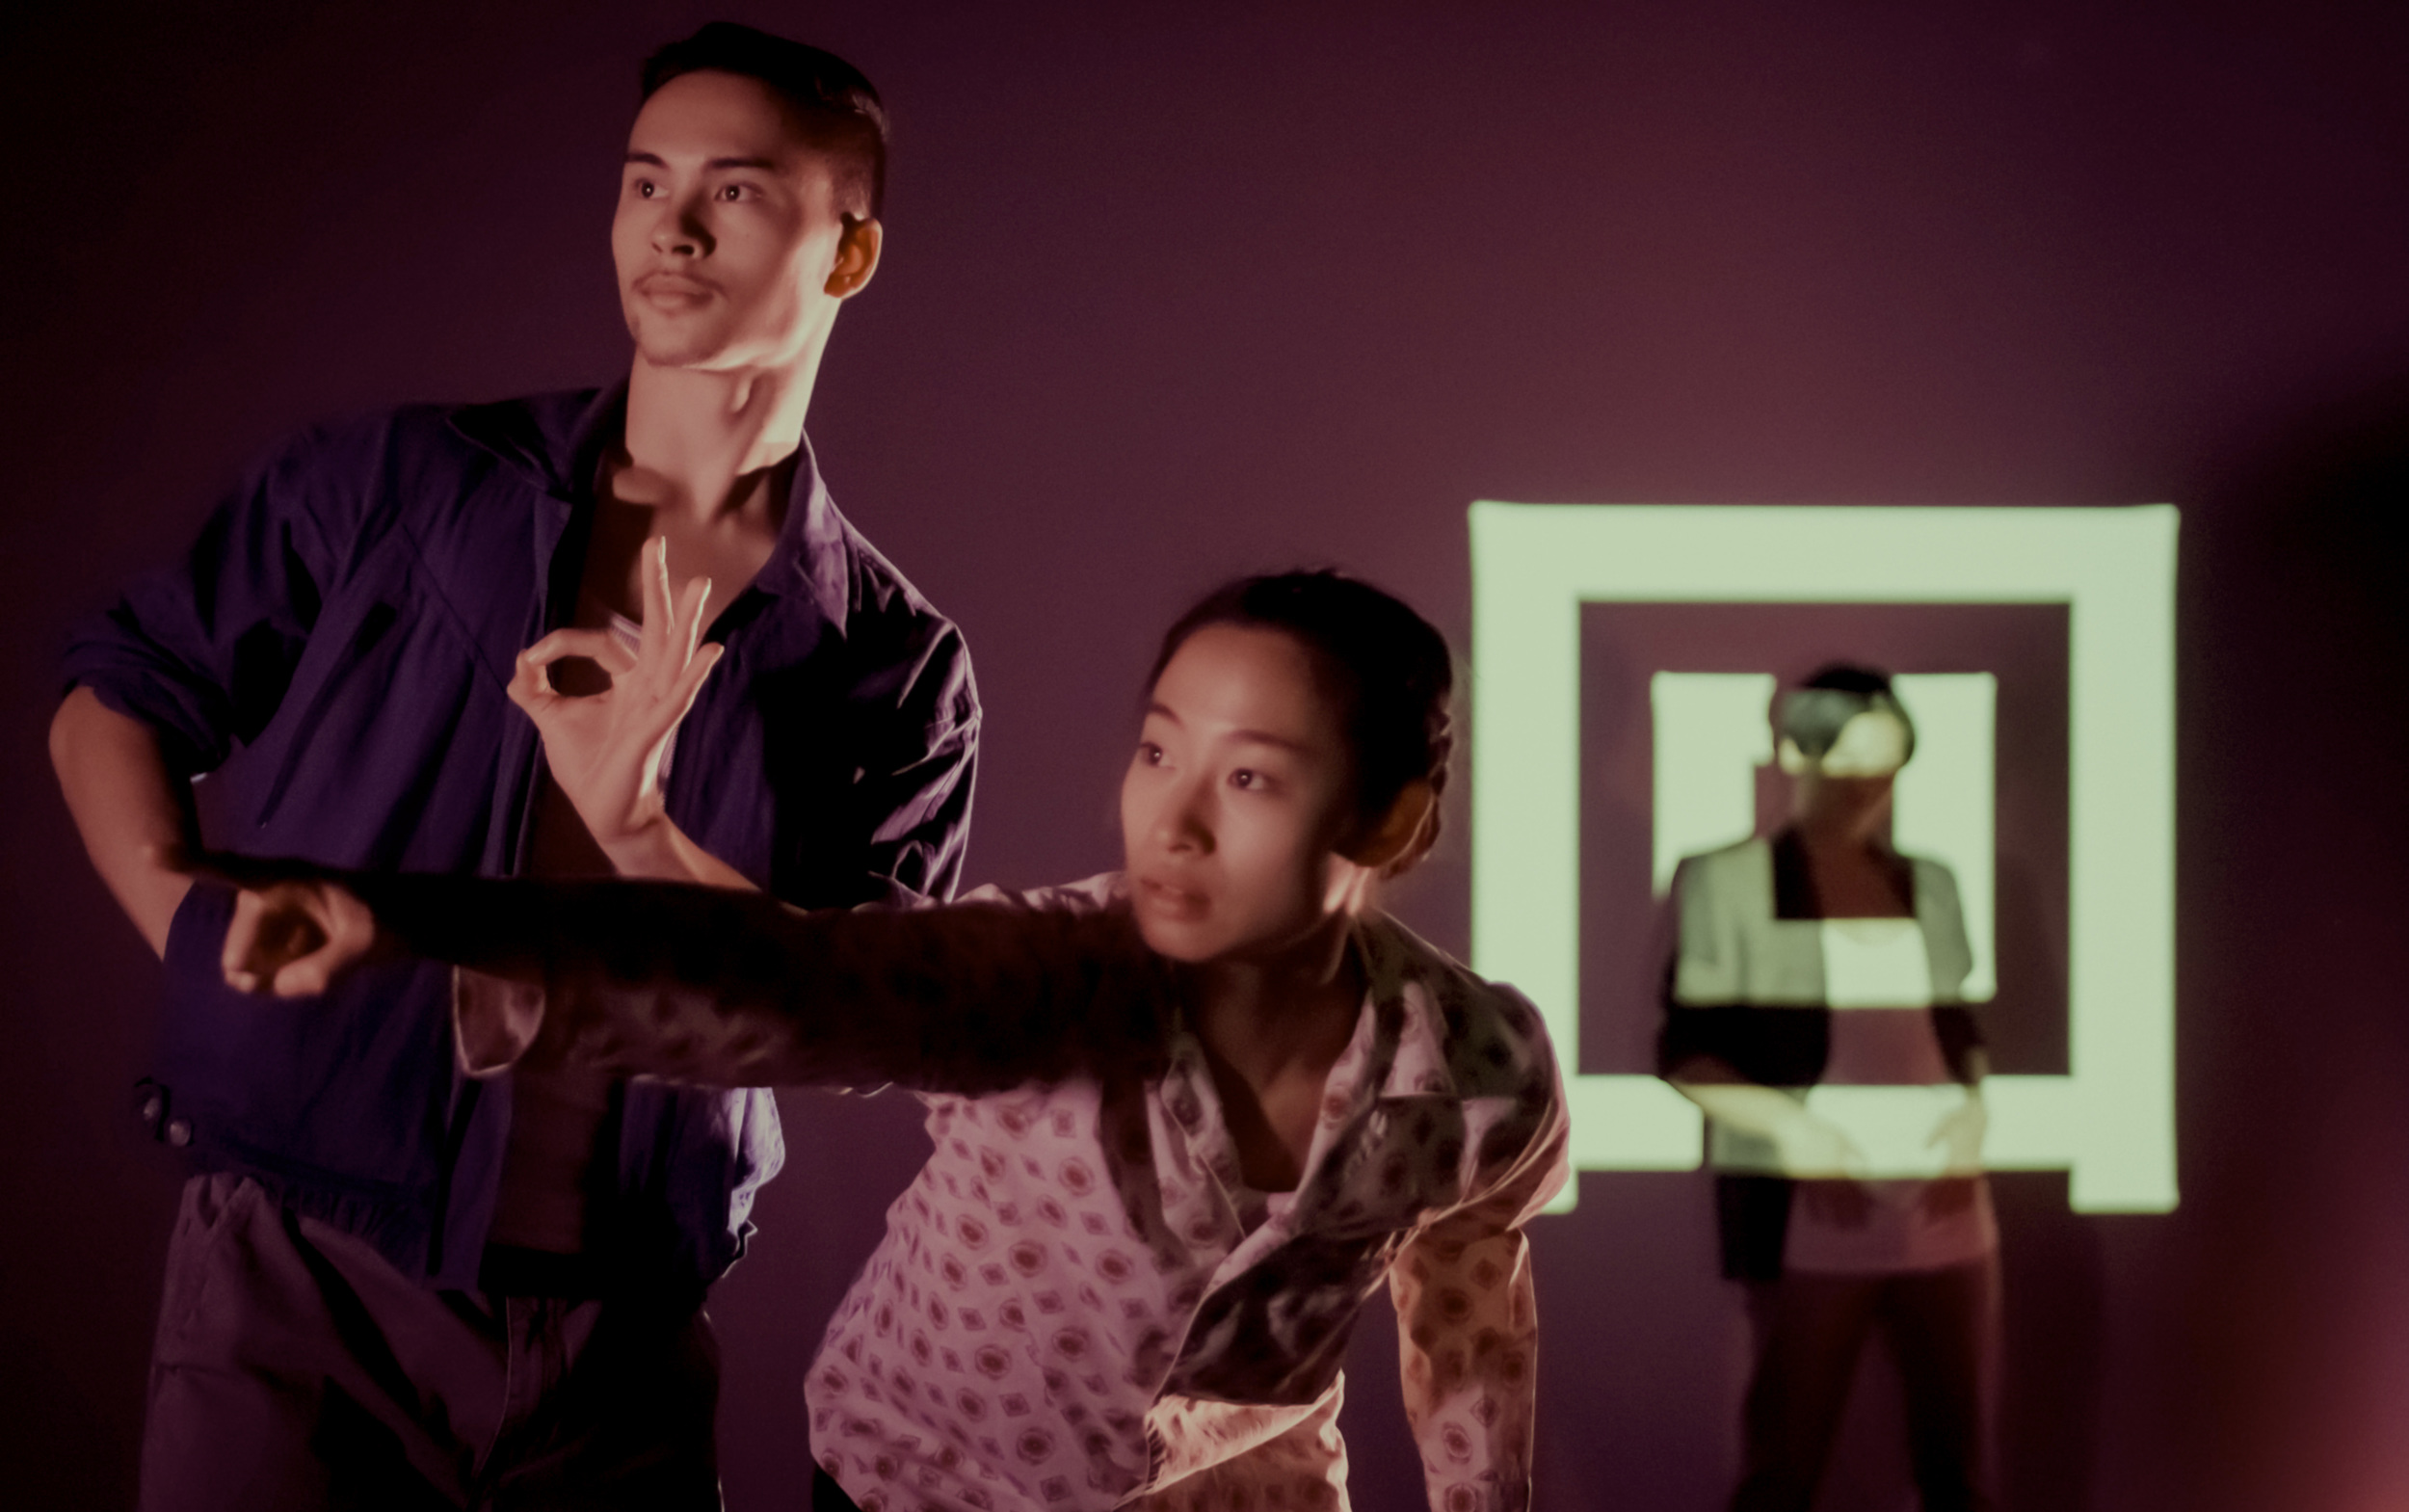 HKX - NINEEIGHT Promotional Photo 1.jpg